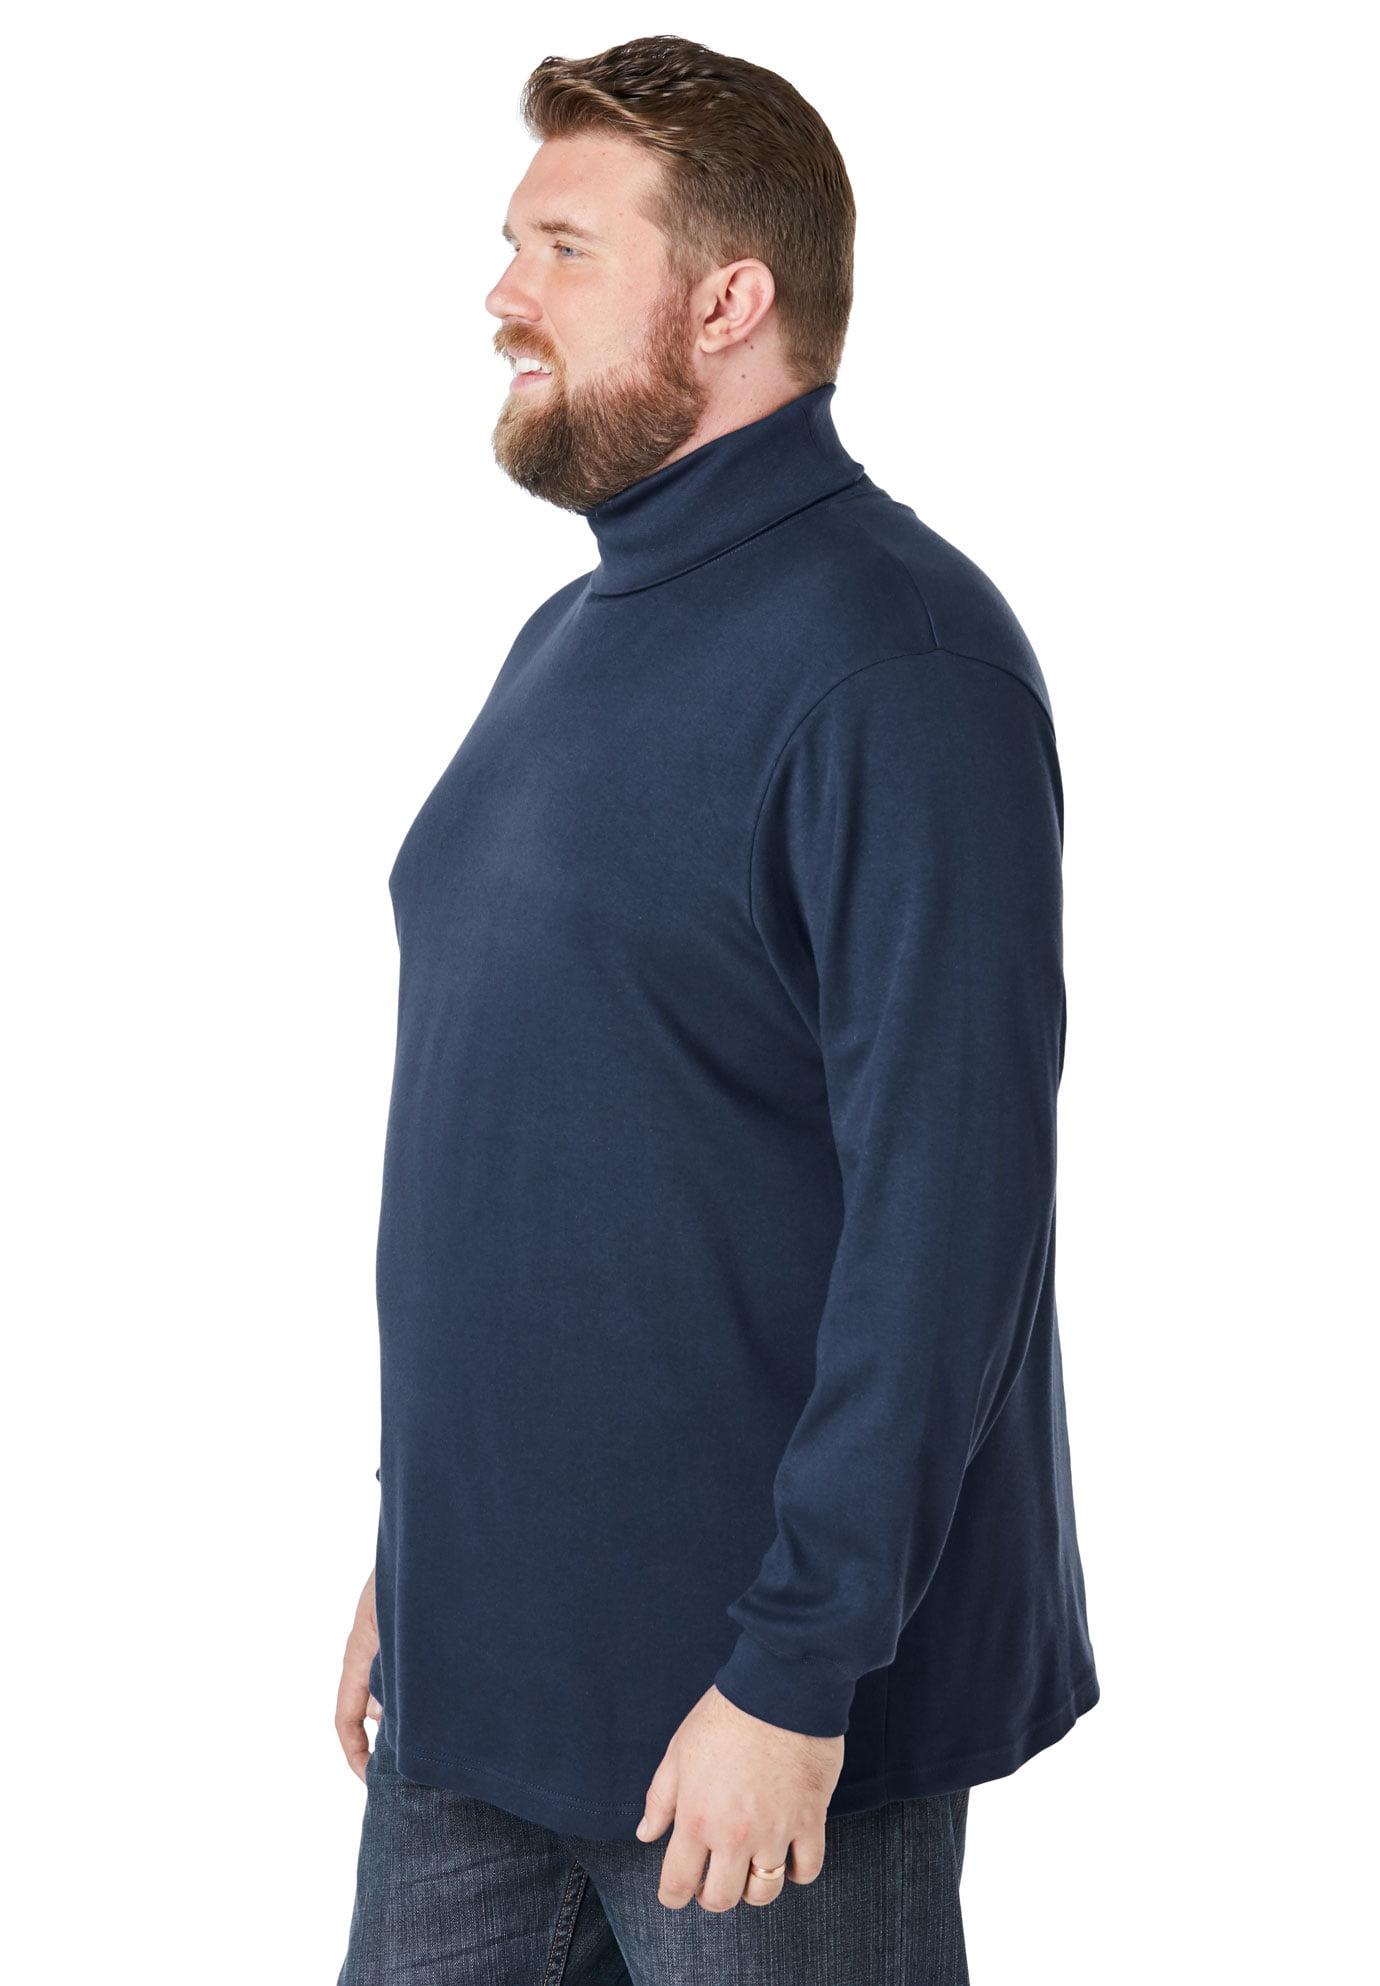 KingSize Mens Big /& Tall Tall Turtleneck Long-Sleeve Tee